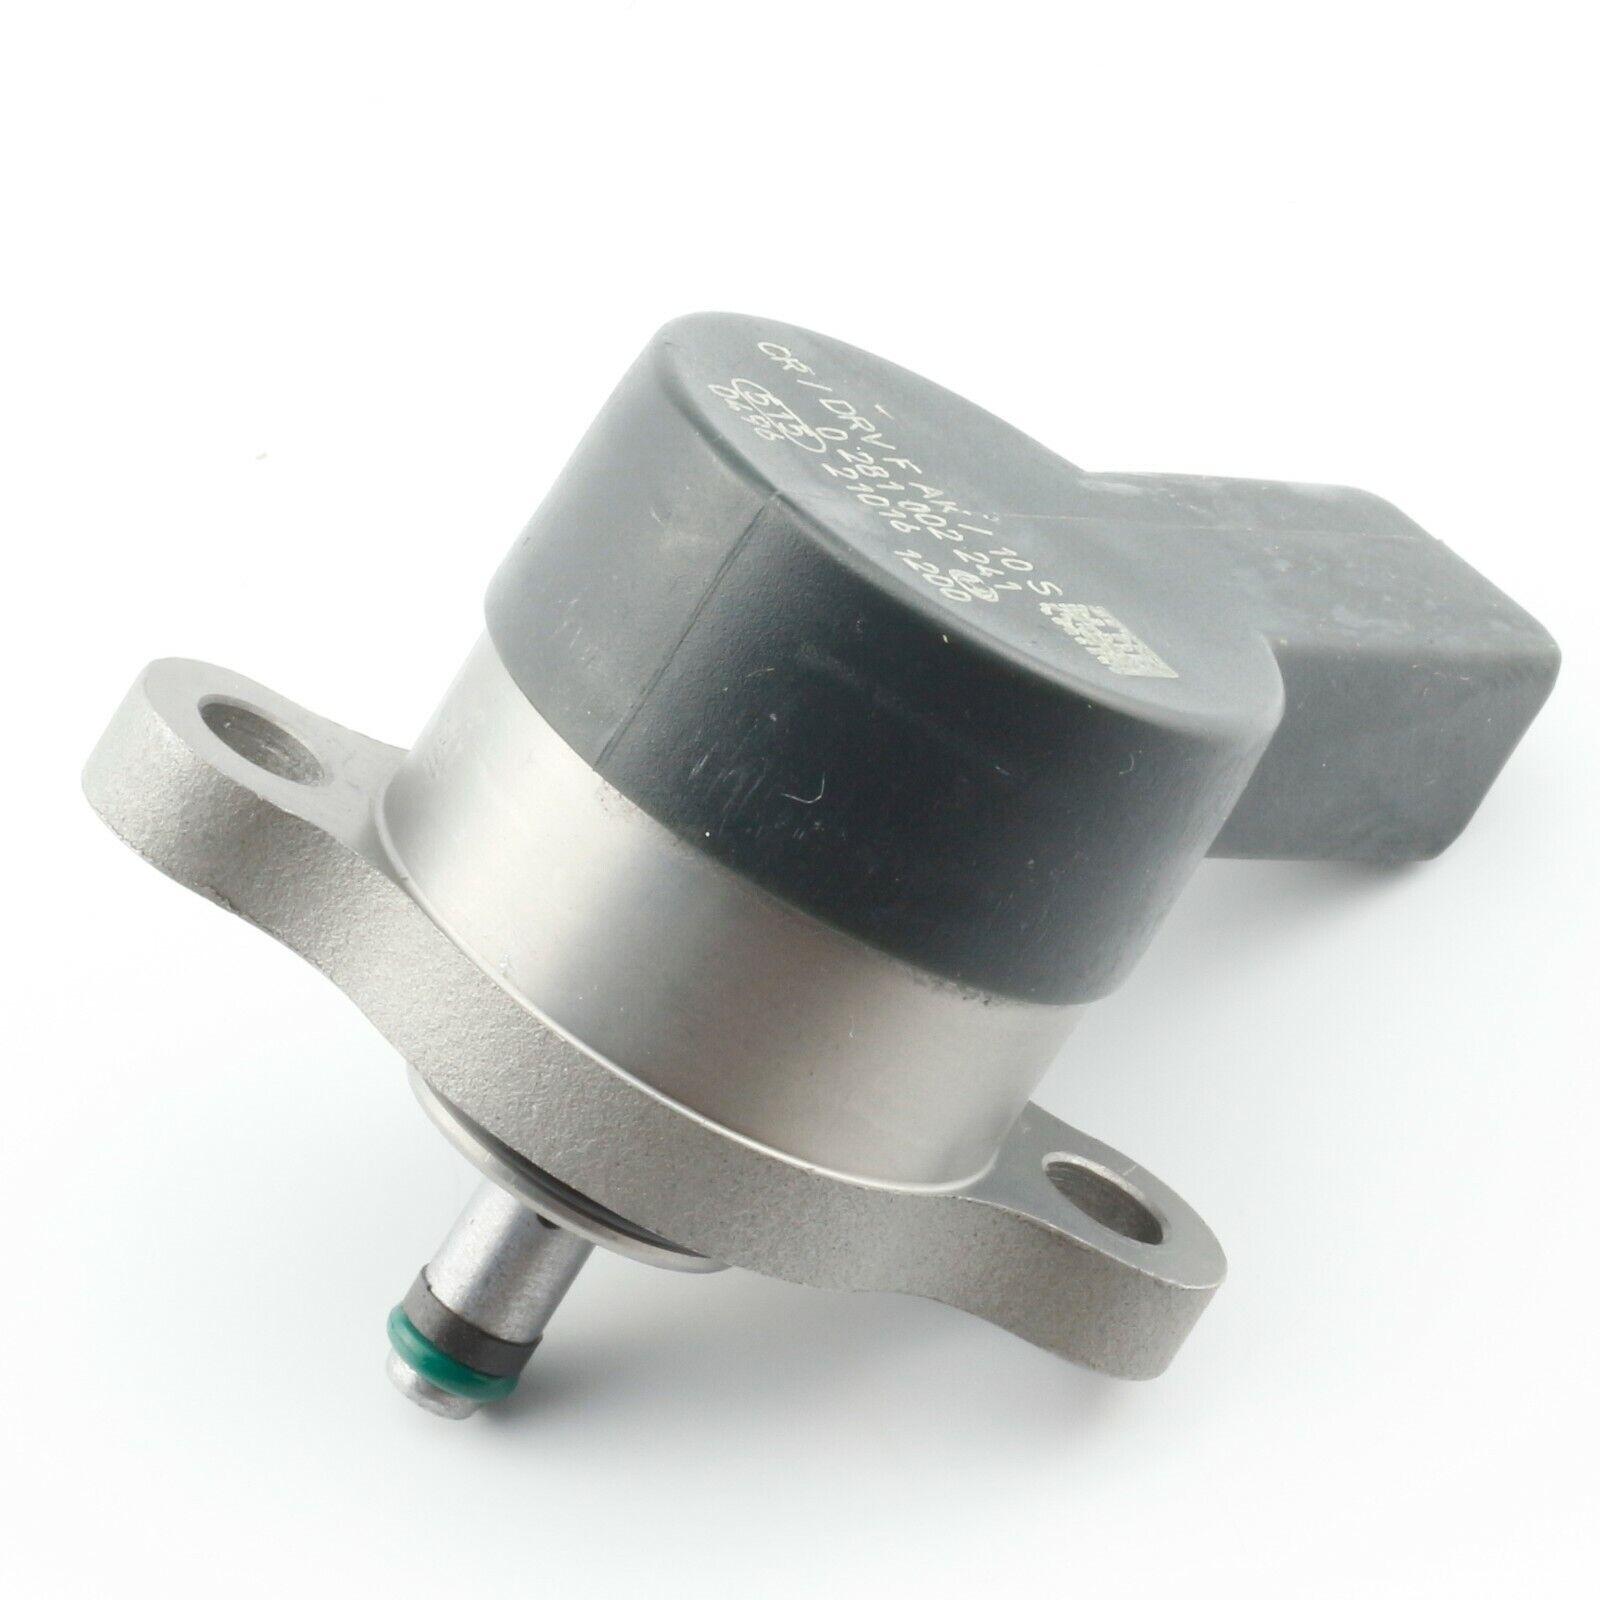 New Fuel Injection Pressure Regulator Valve For Mercedes CDI Sprinter 0281002241